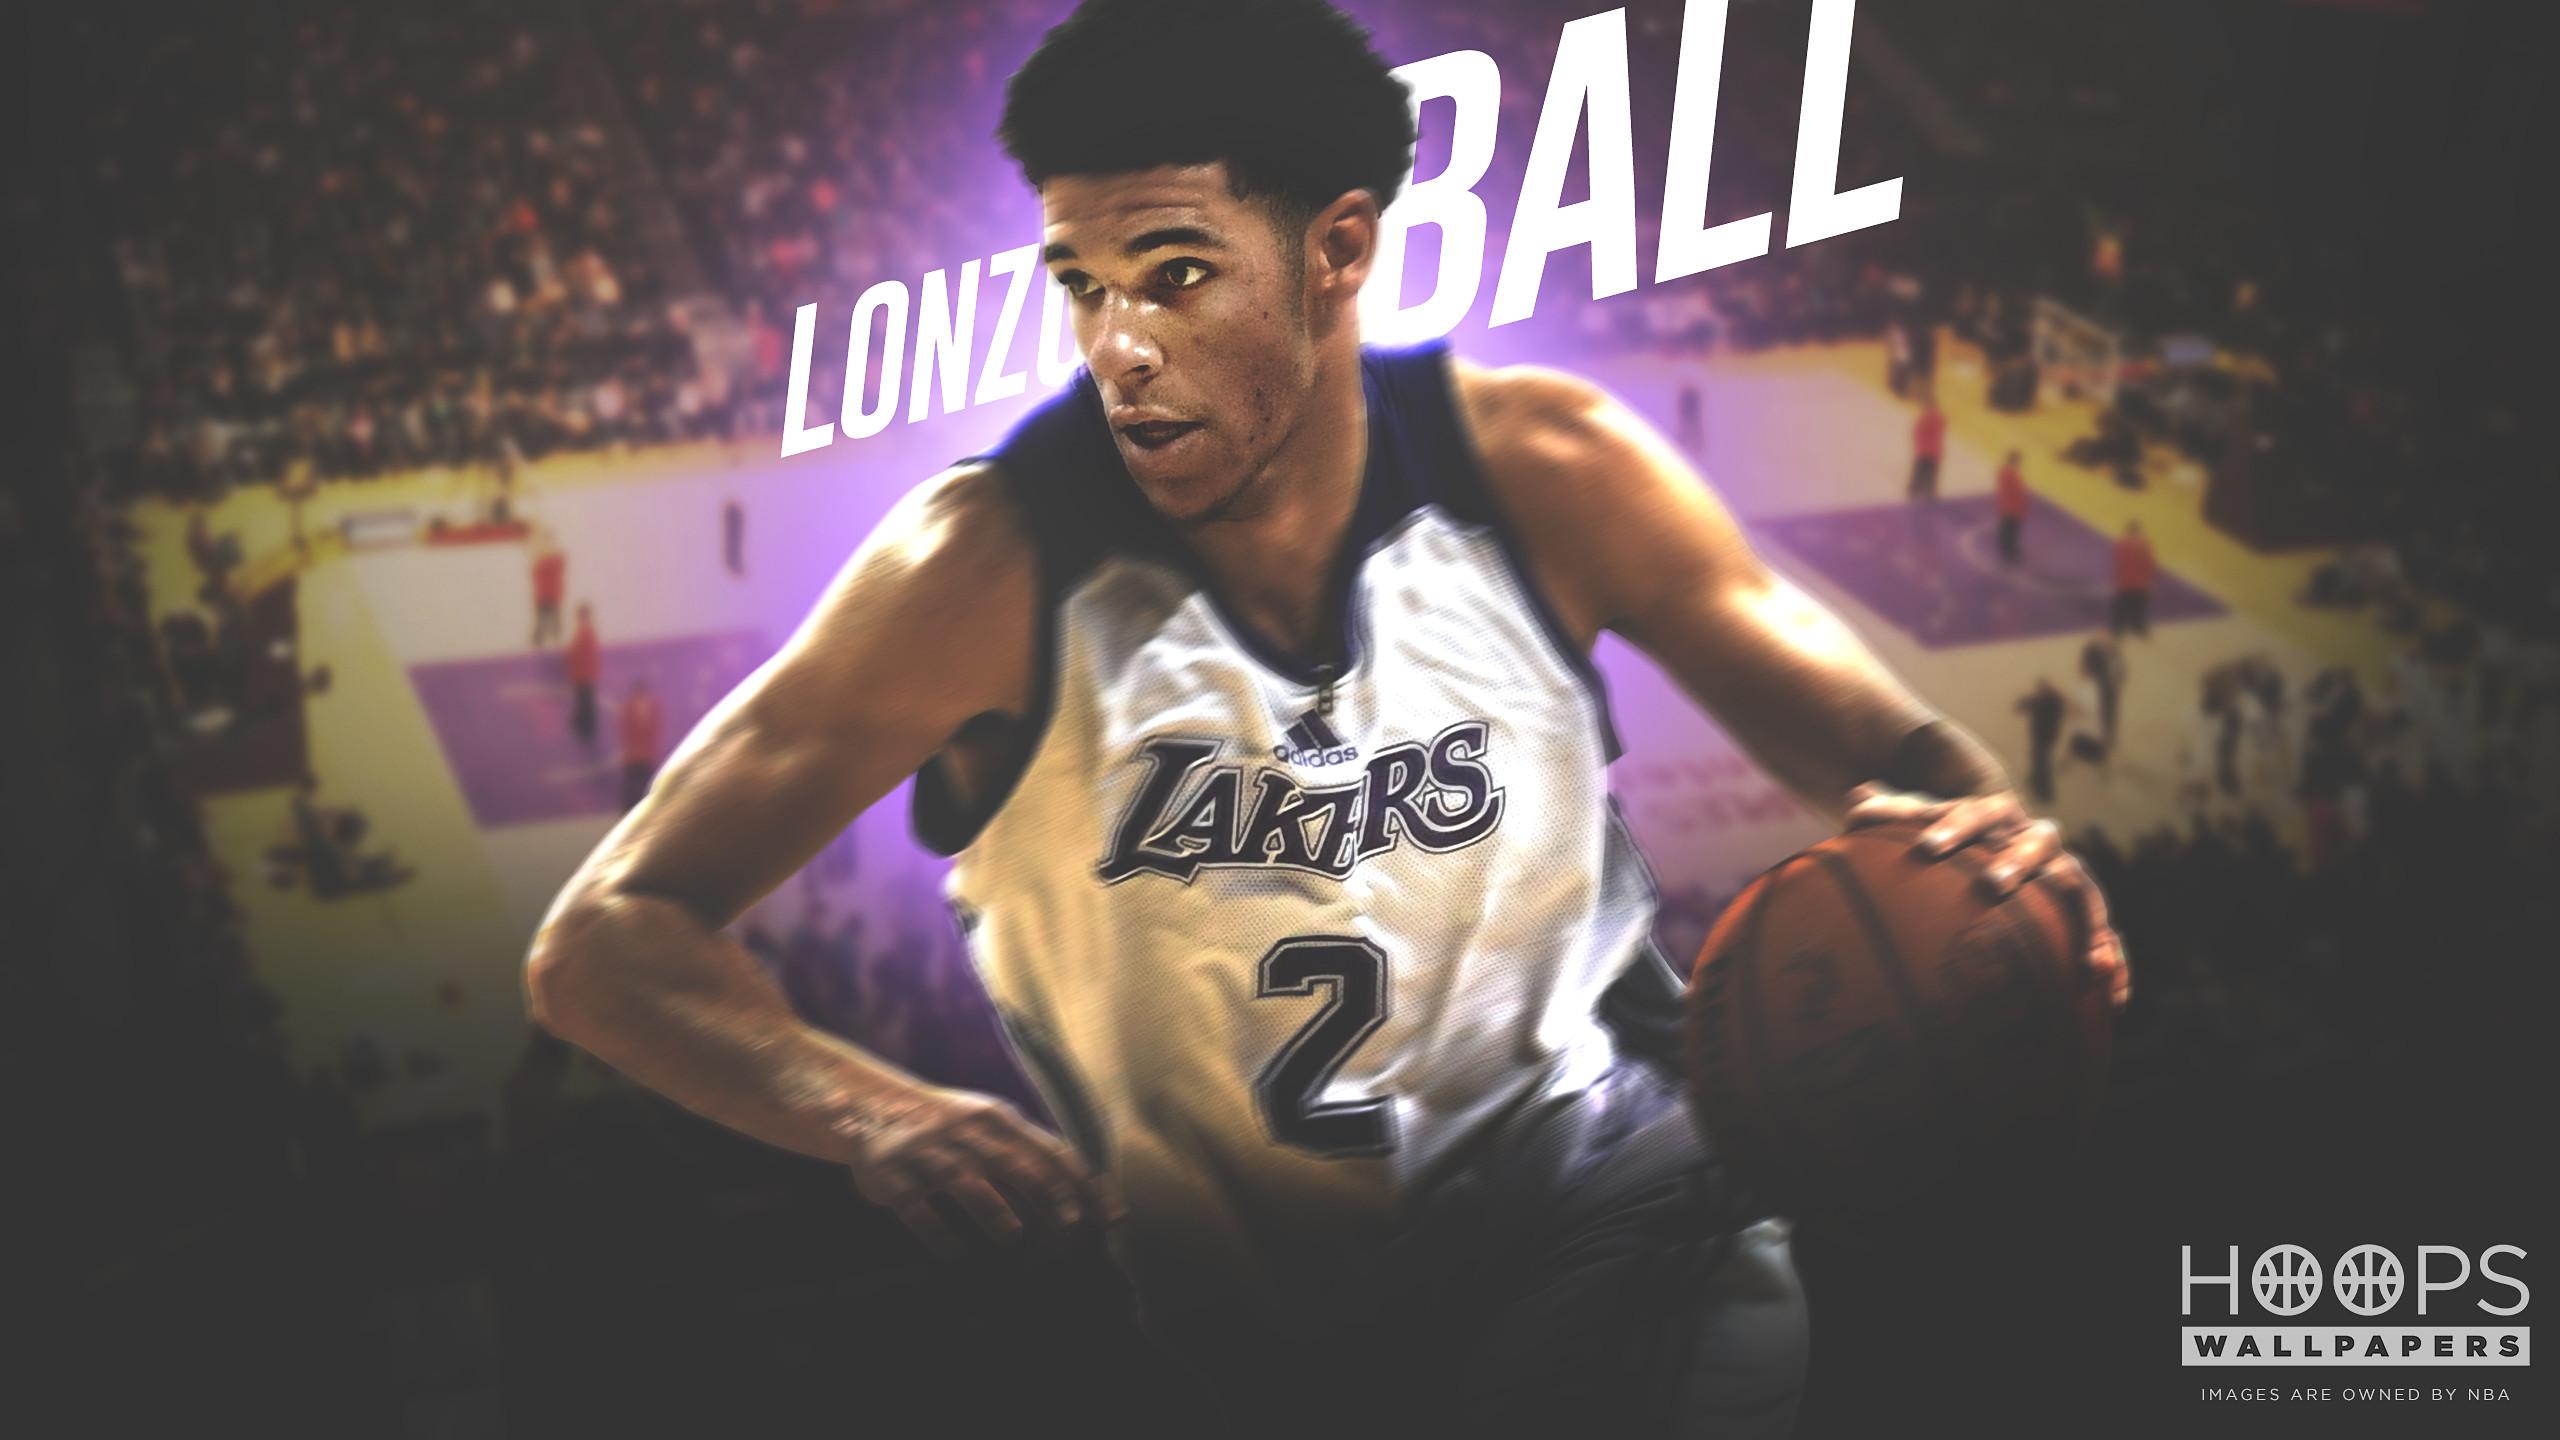 NBA Wallpapers Lebron James 2018 77 images 2560x1440